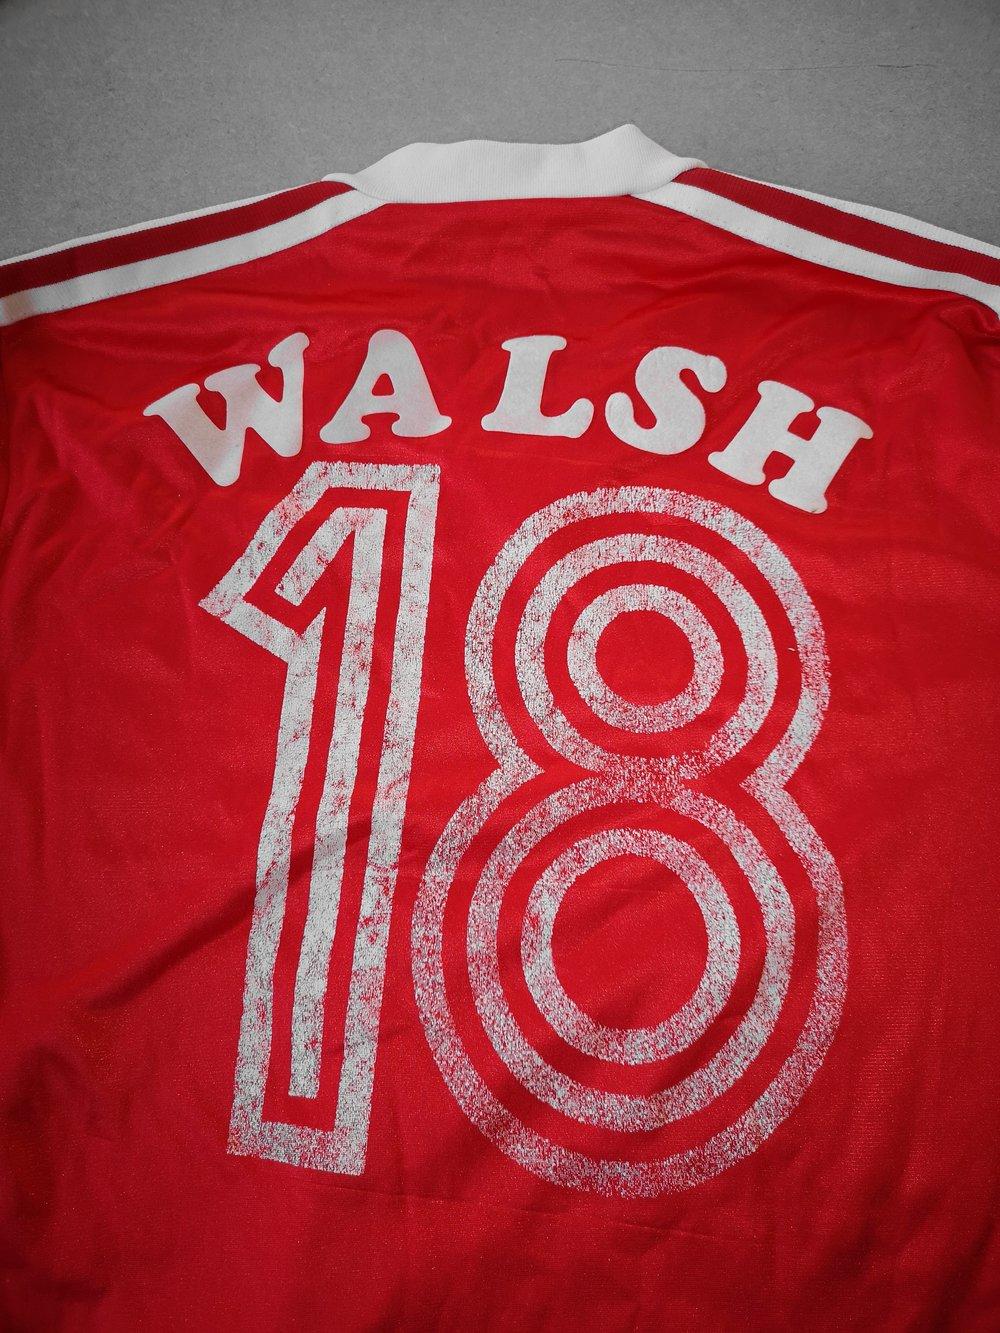 nottingham forest football shirt walsh